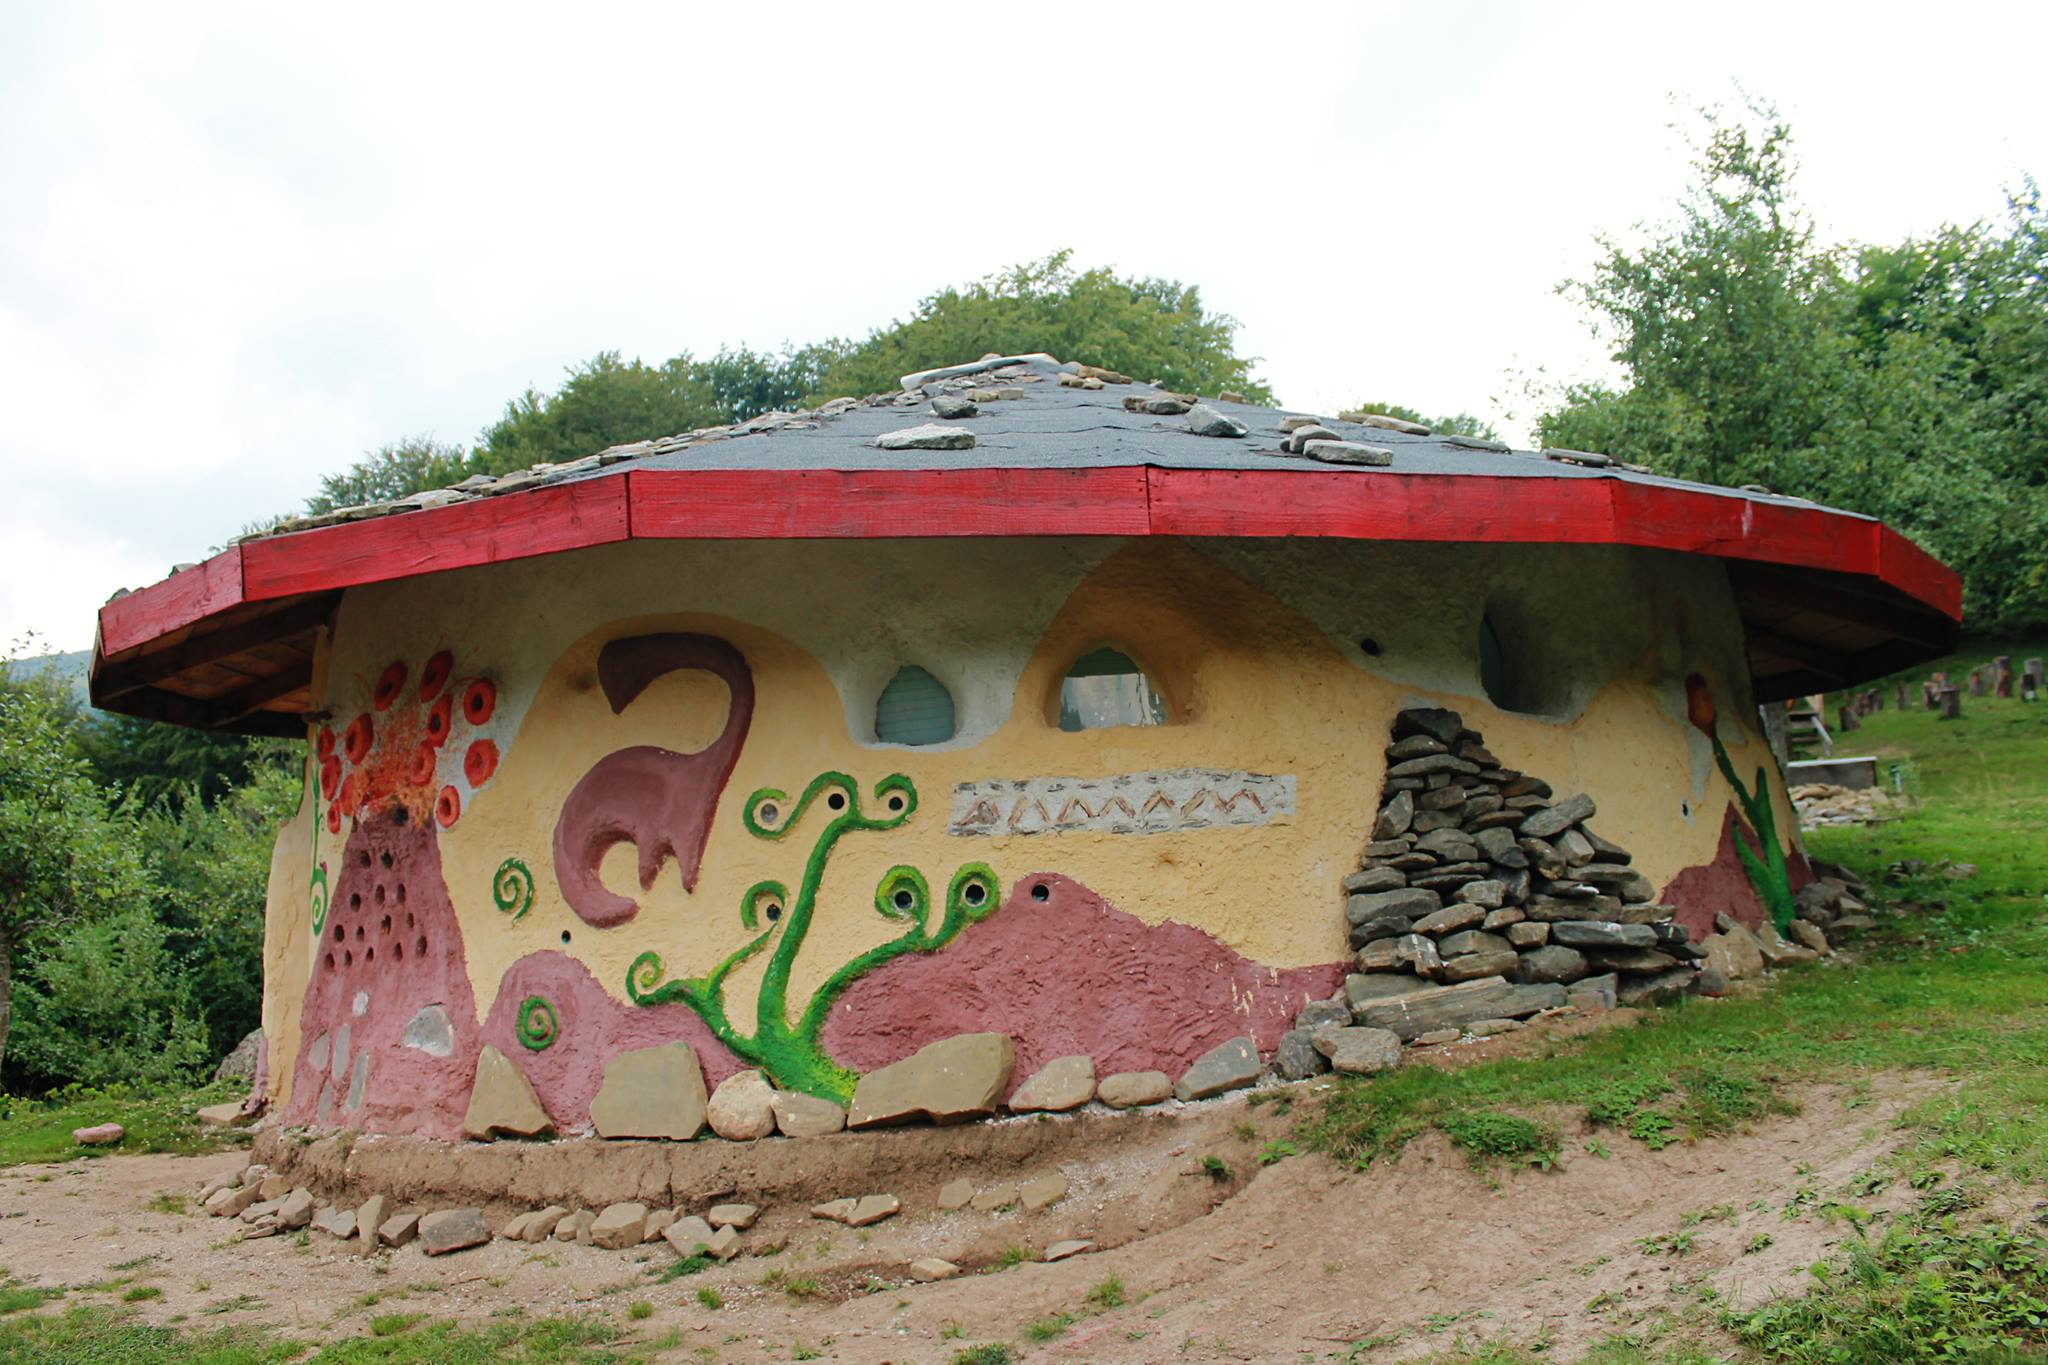 dinozauri-zimbri-si-o-biserica-ciudata-densus-23